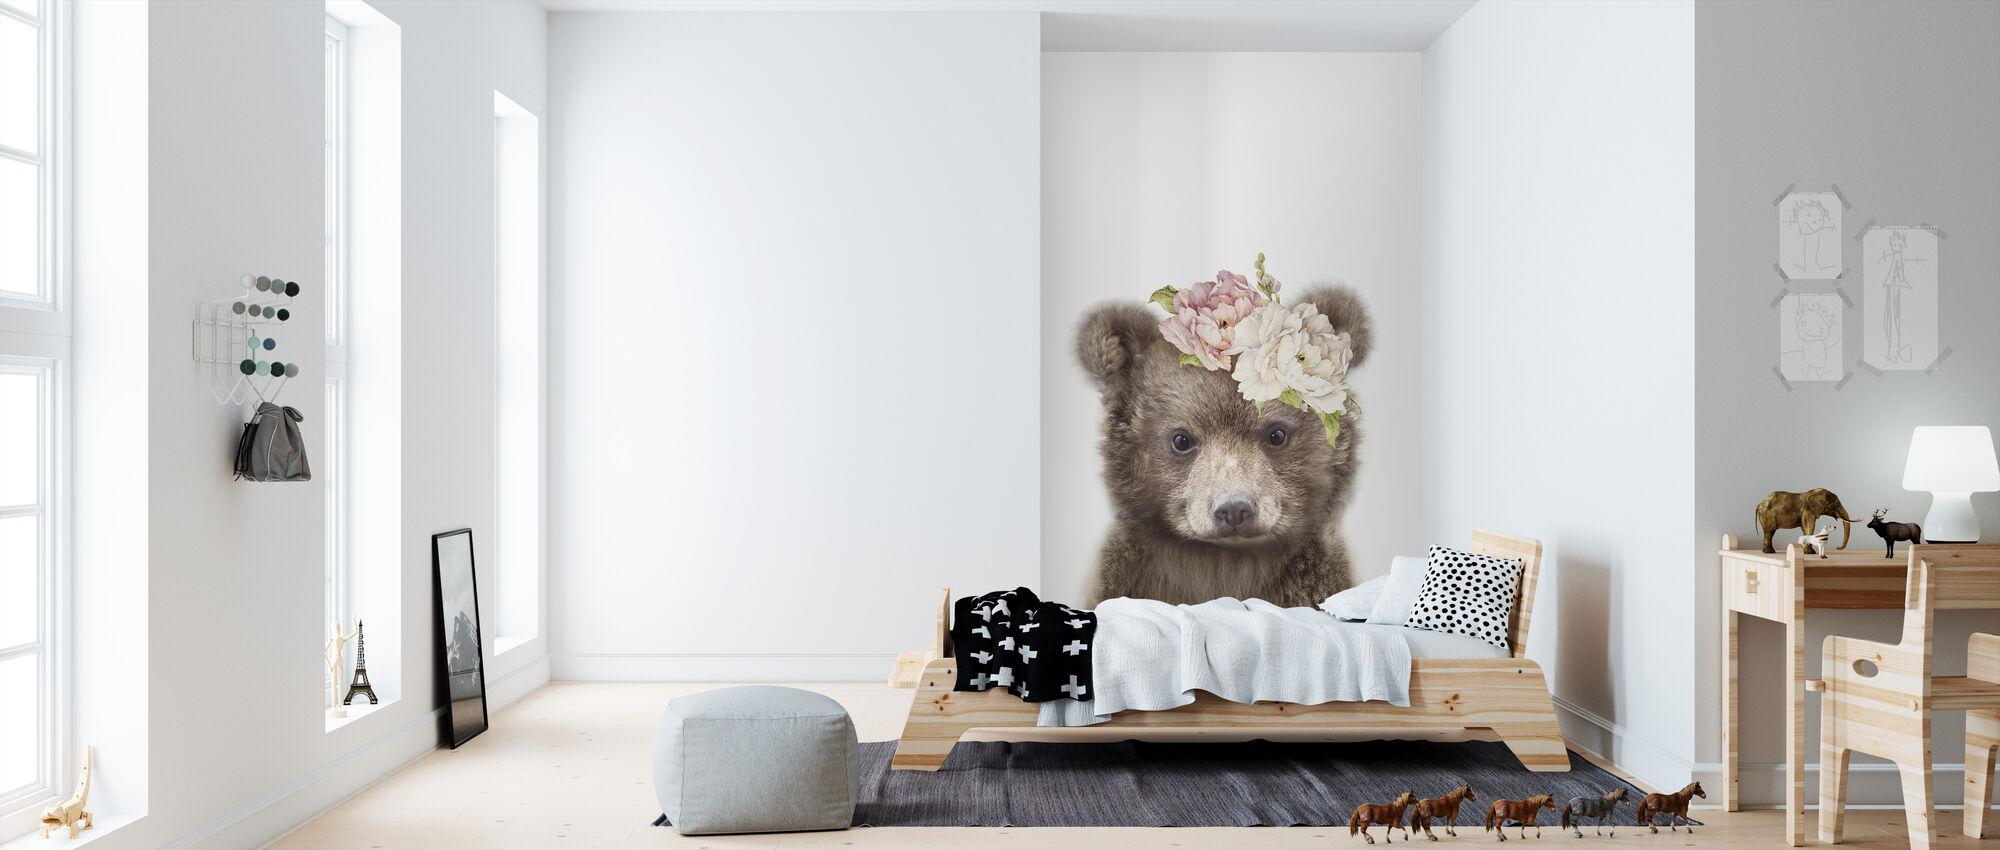 Floral Baby Bear - Wallpaper - Kids Room